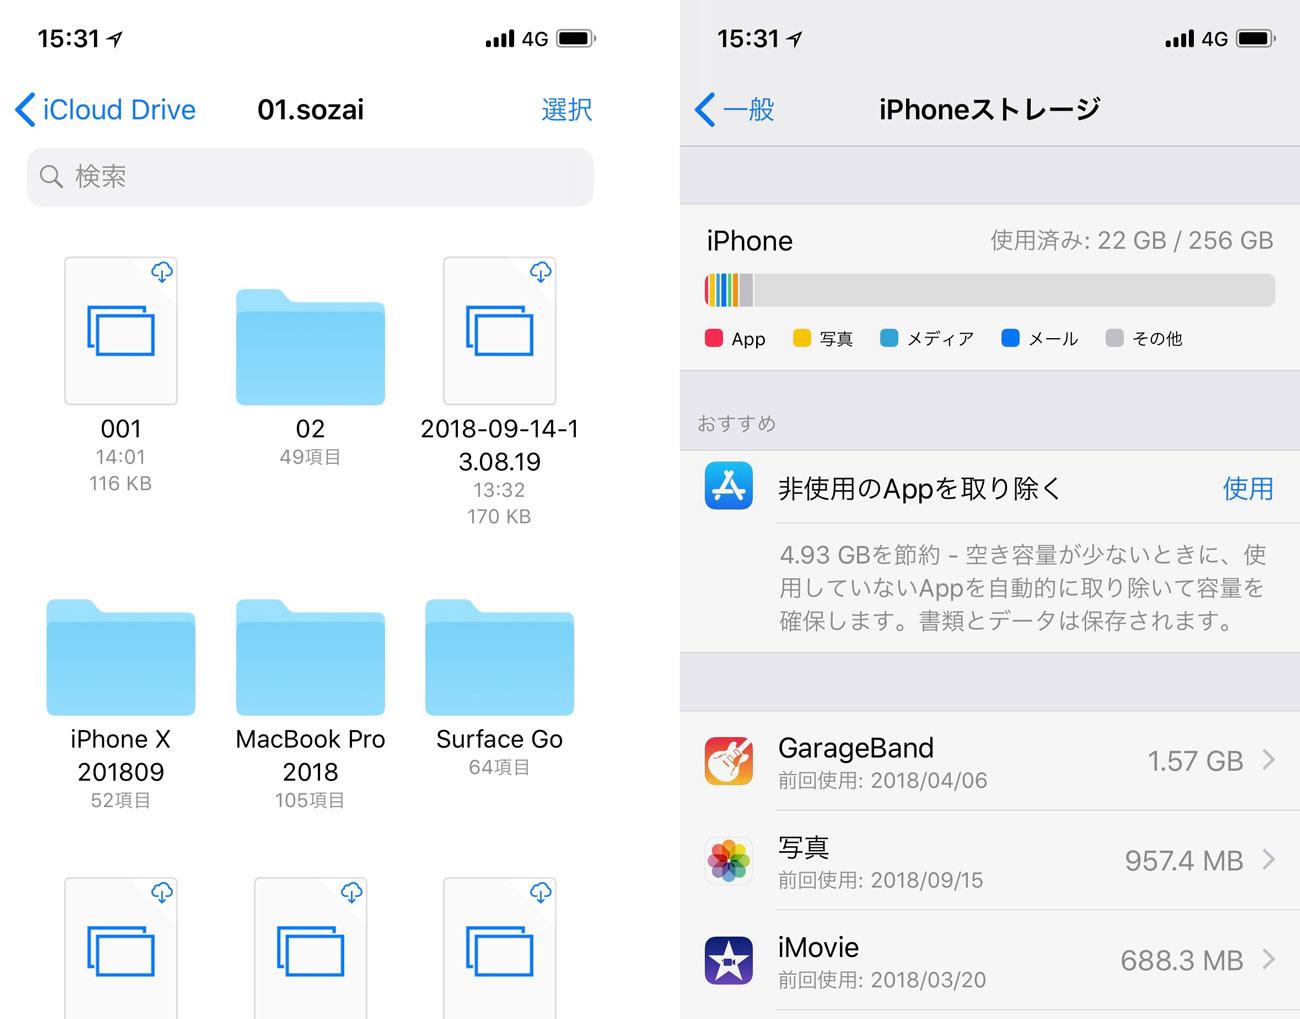 iCloud Drive ファイル